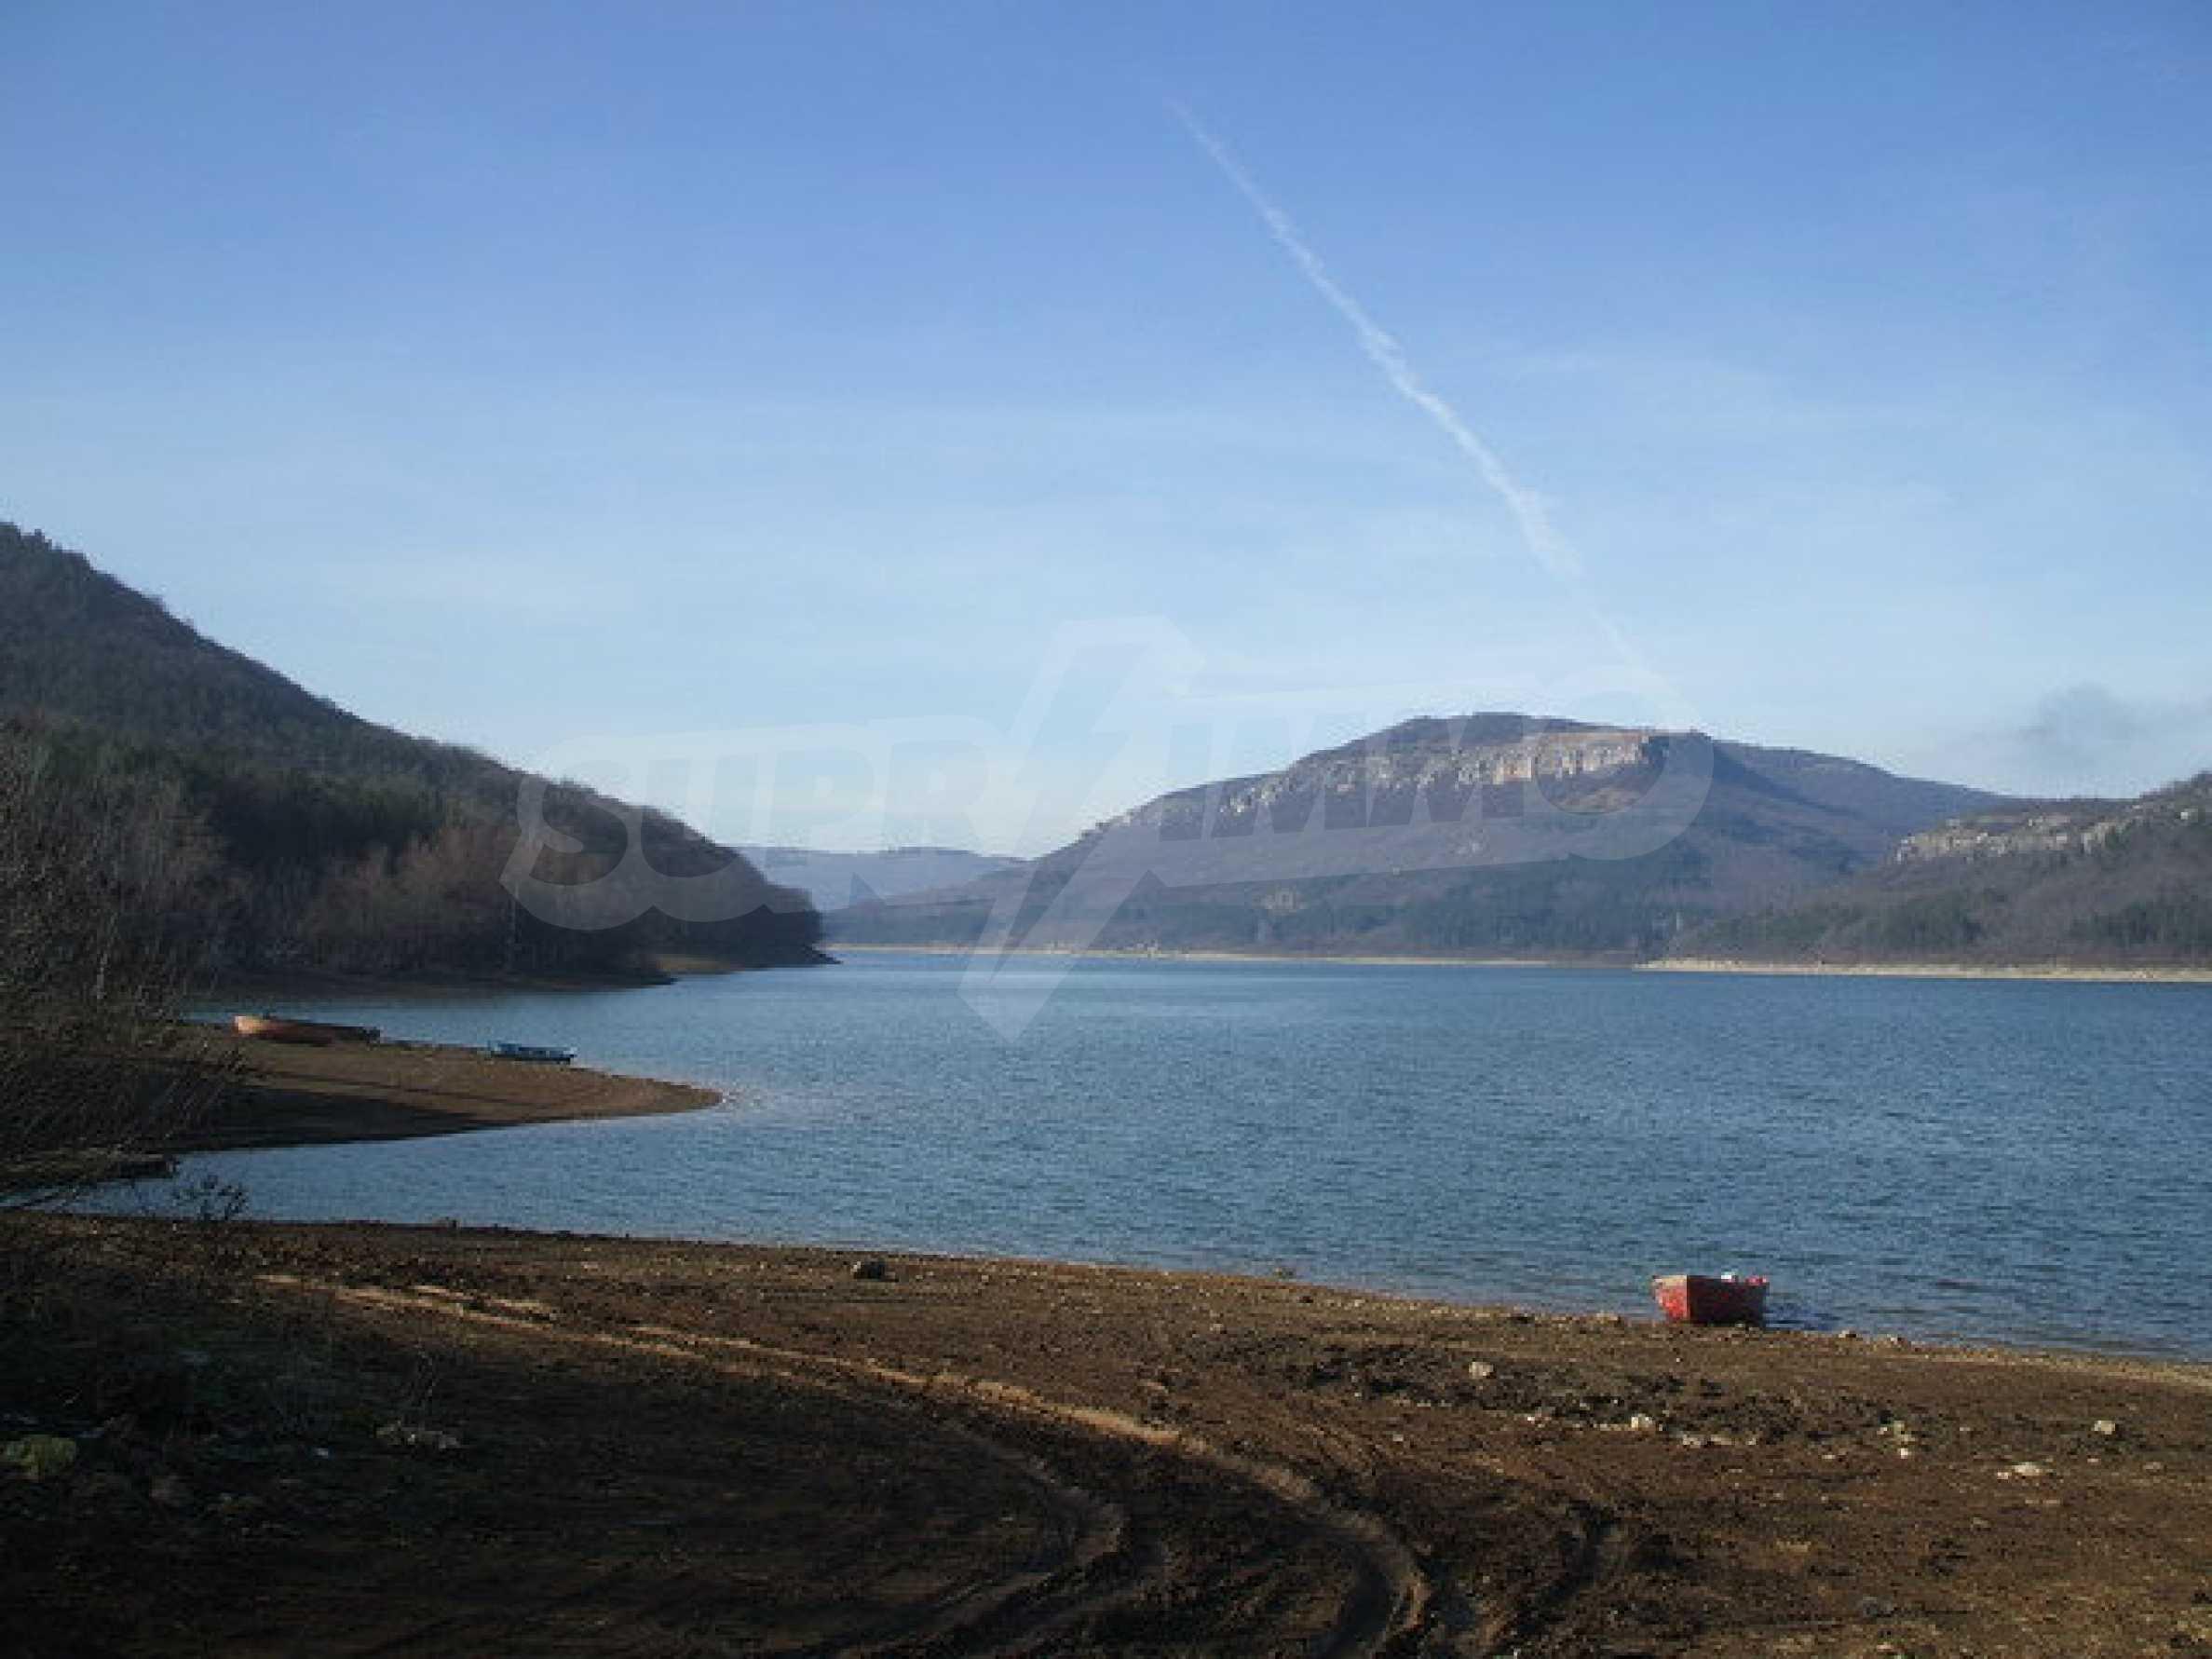 Land in regulation near Lake Alexander Stamboliyski 10